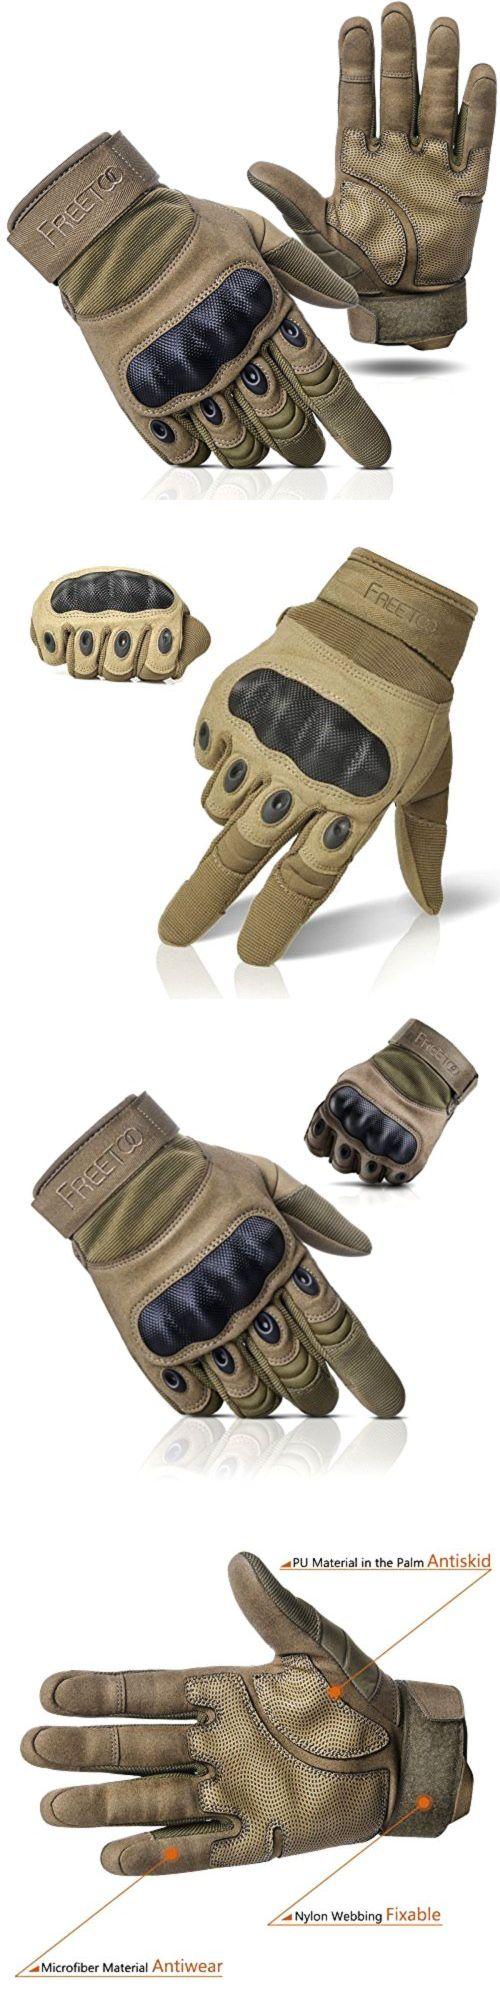 Male gloves ebay - Tactical Gloves 177898 Freetoo Adjustable Men S Tactical Gloves Hard Knuckle Sewn In Brass